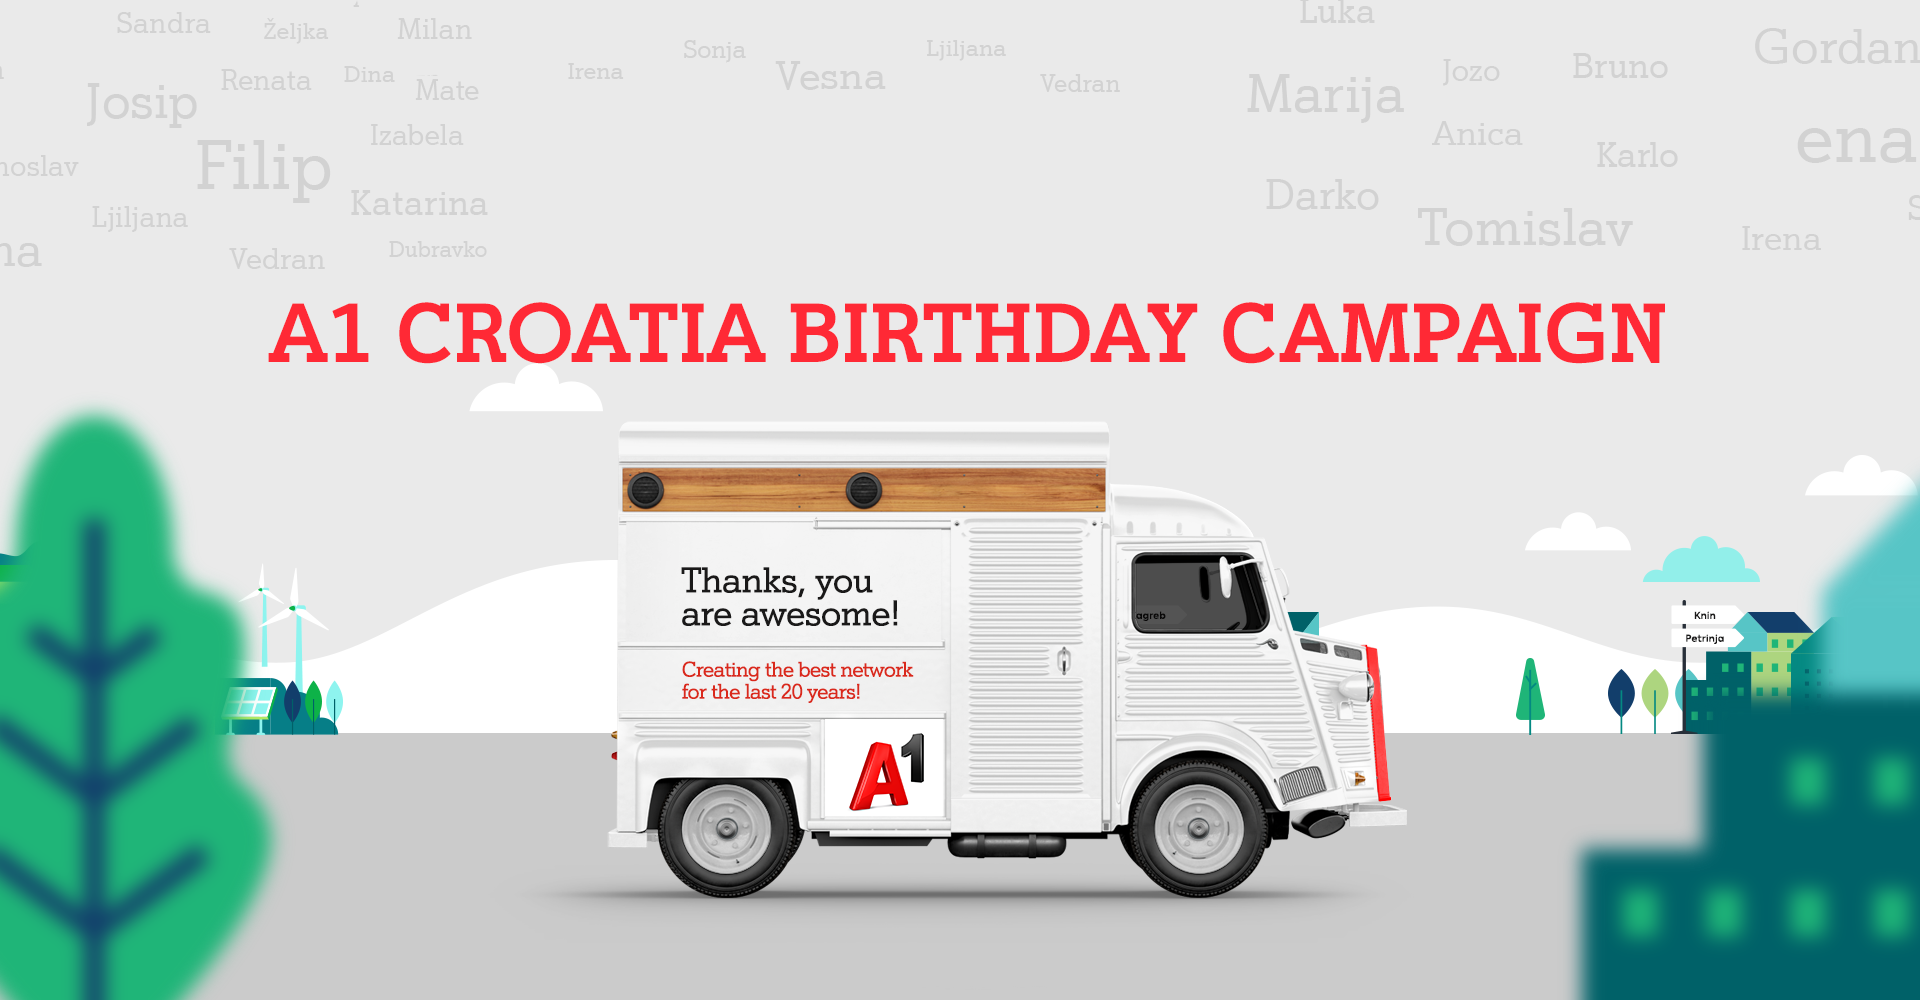 A1 Croatia - Birthday campaign